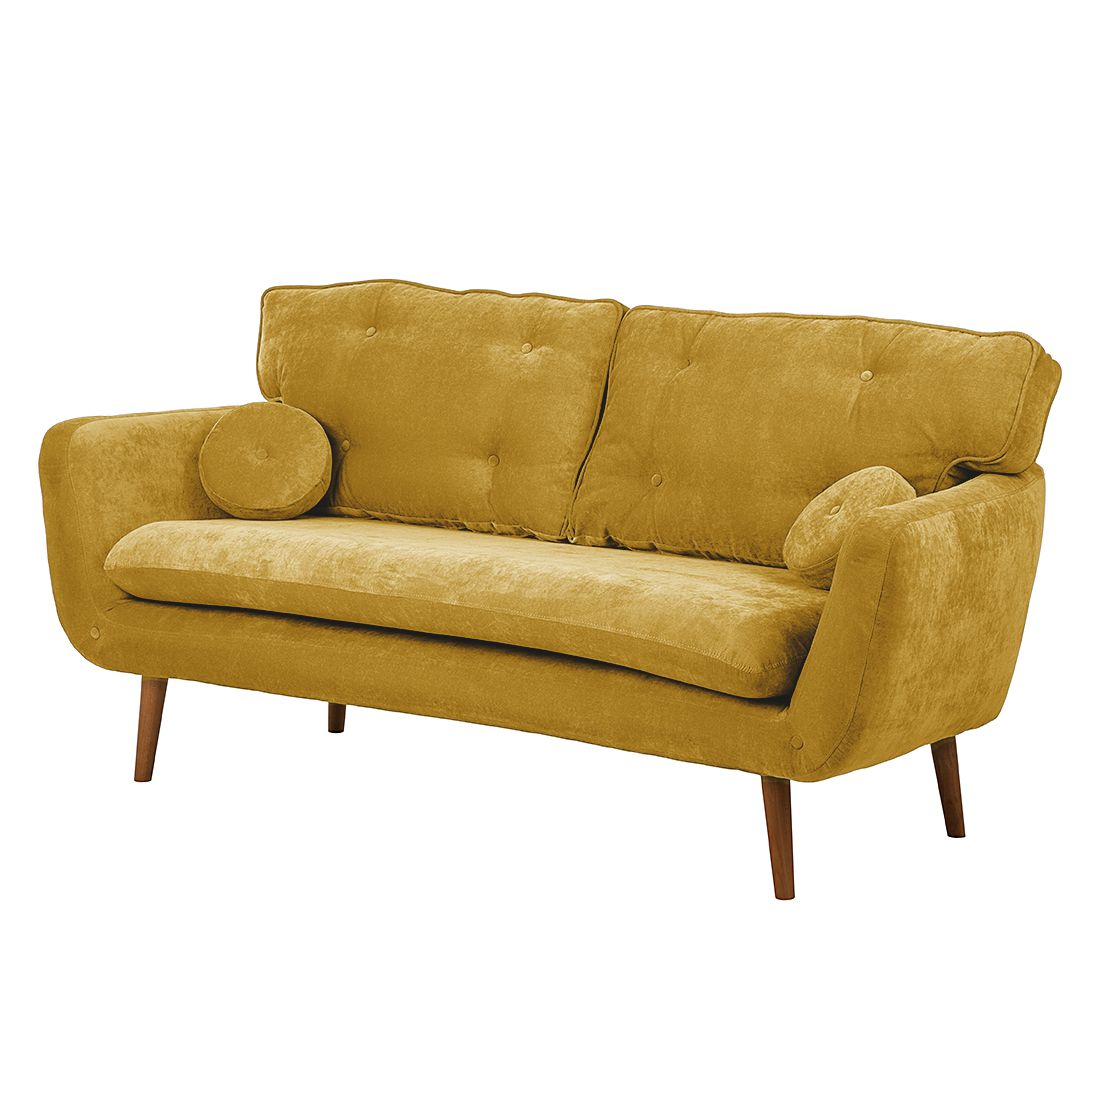 sofa lillbro 3 sitzer microfaser senfgelb m rteens. Black Bedroom Furniture Sets. Home Design Ideas